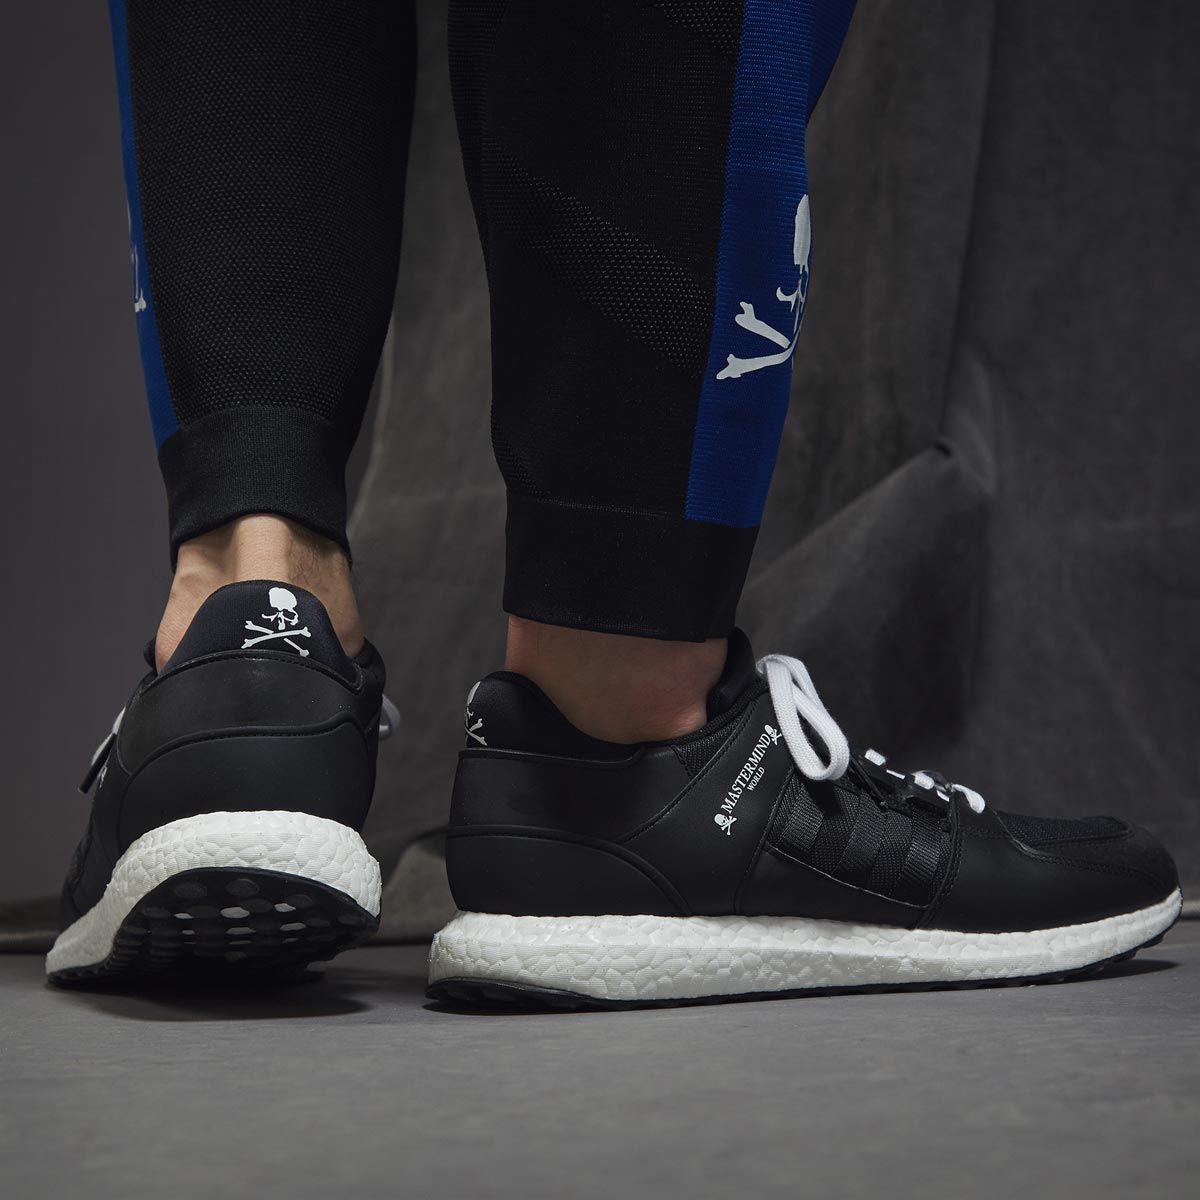 Adidas x Mastermind World EQT Support ultra blanco / negro para hombres